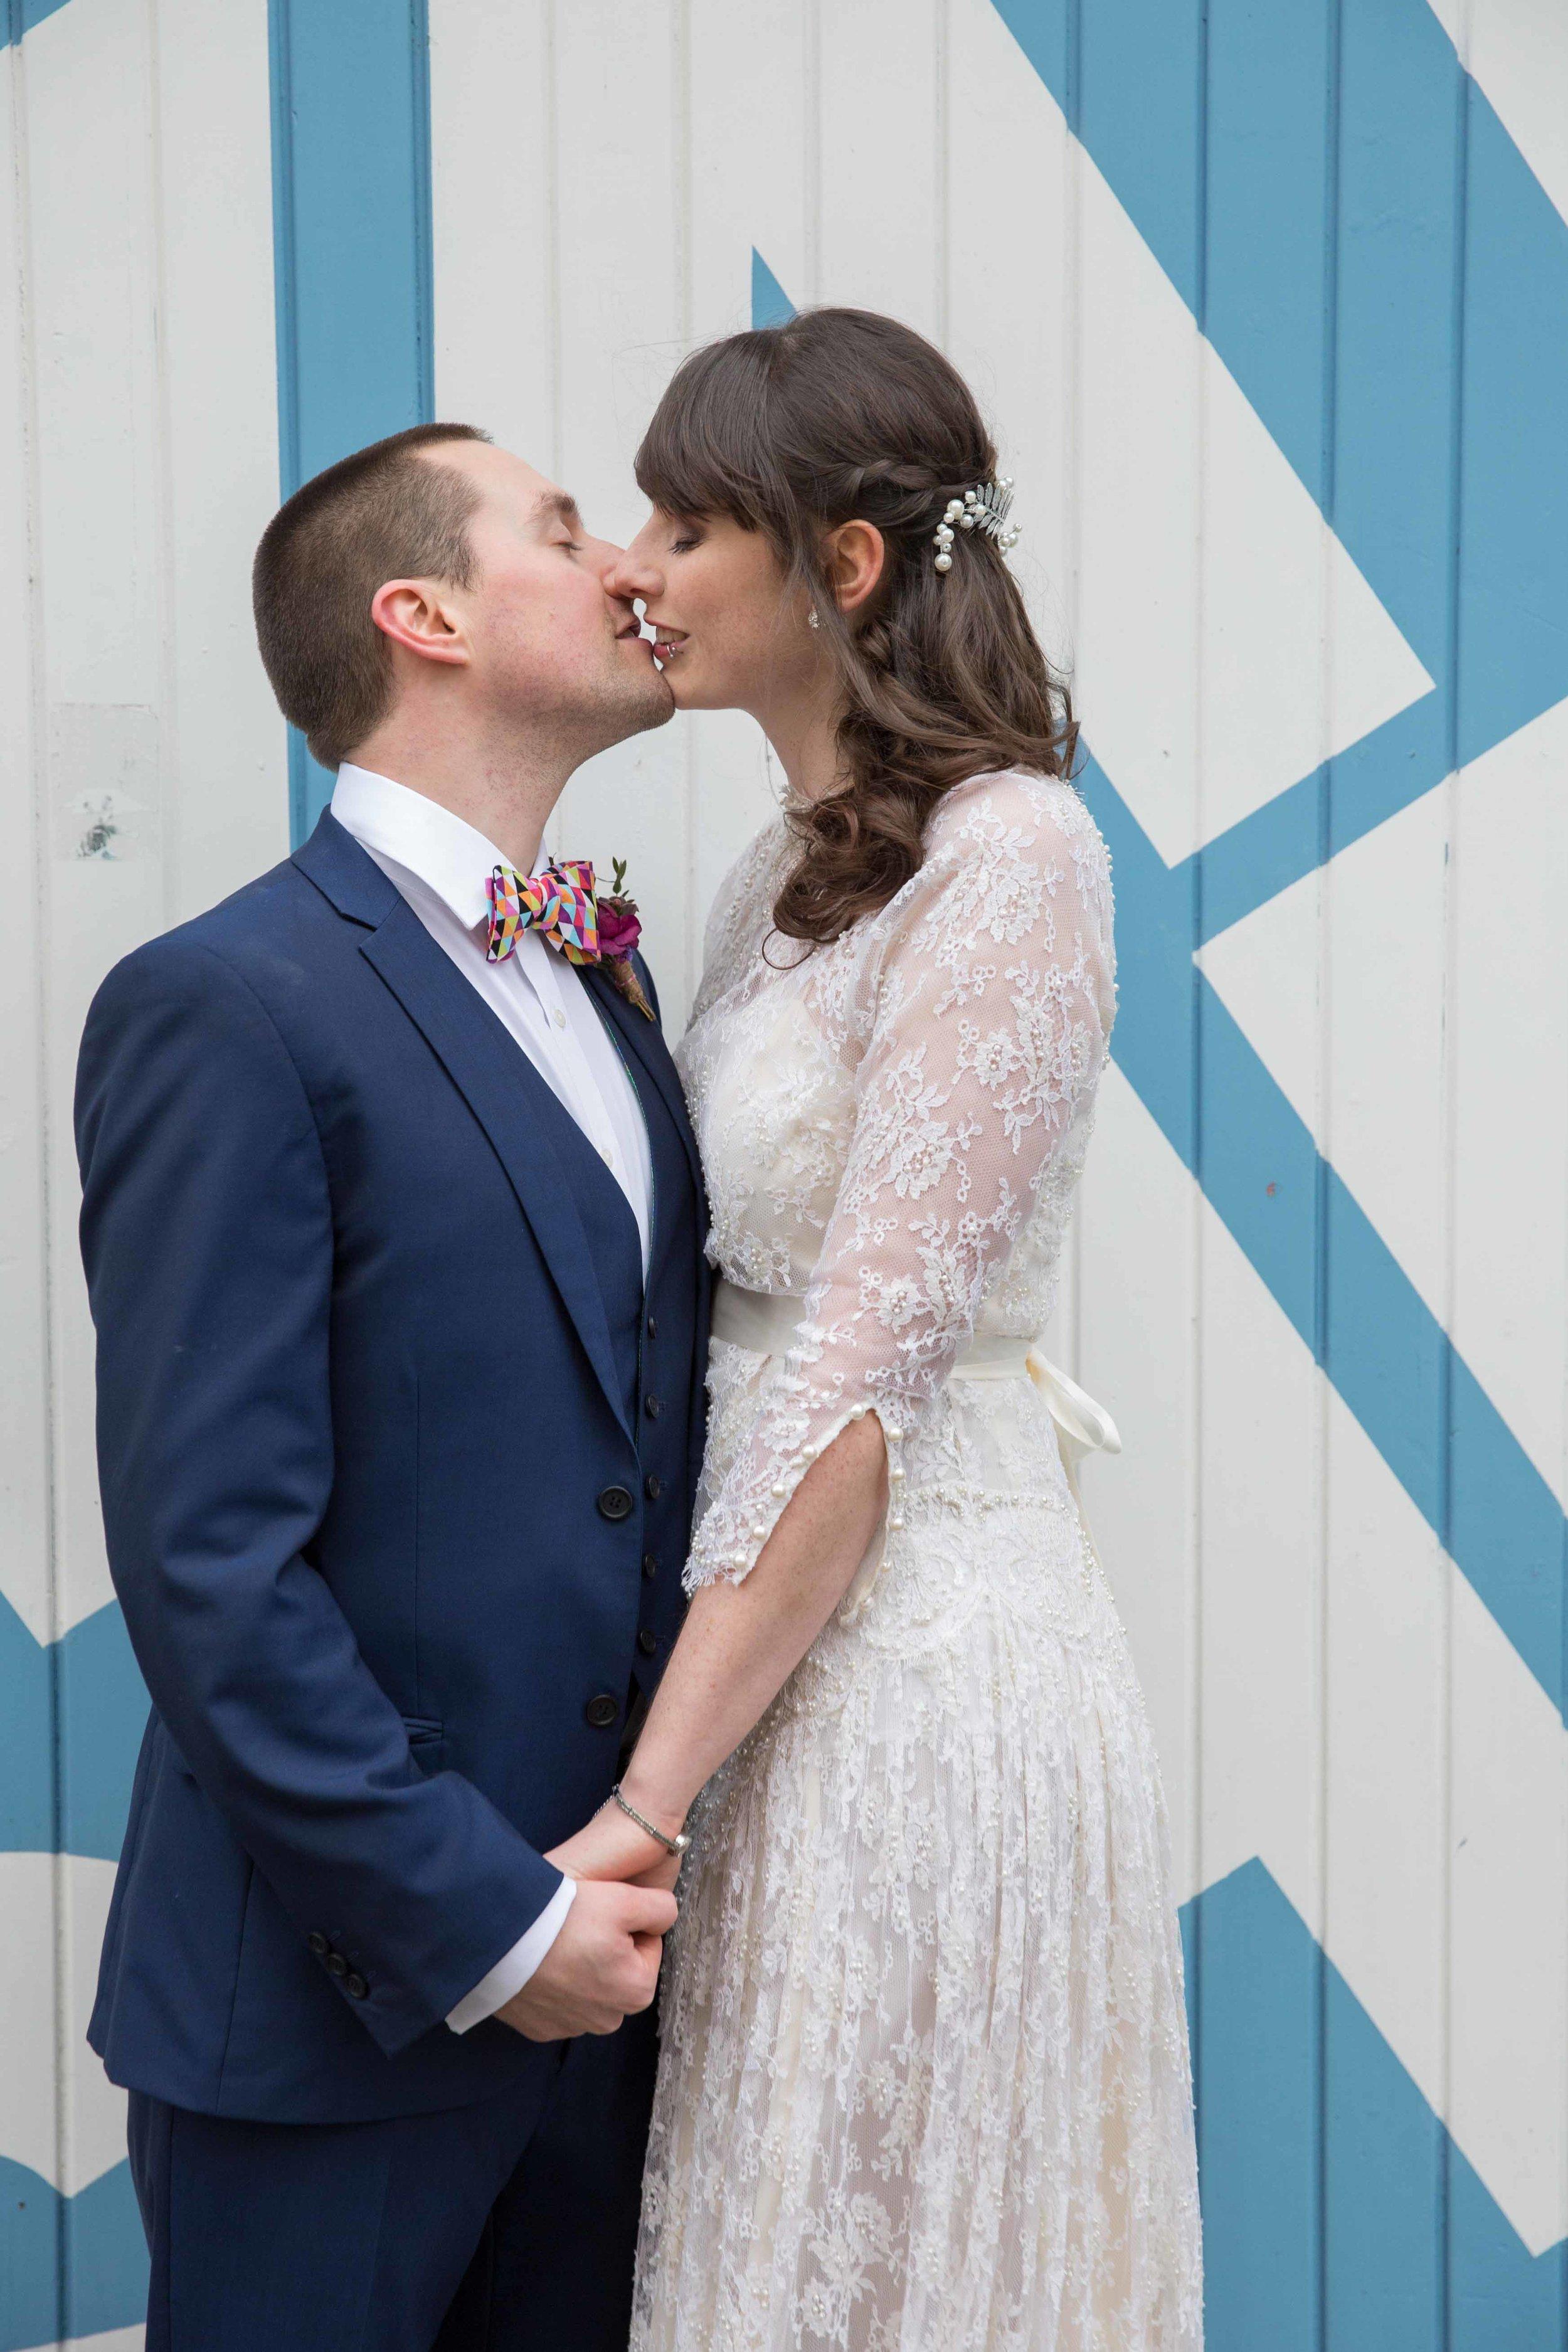 Adam & Faye - Wright Wedding Photography - Bristol Wedding Photographer -258.jpg